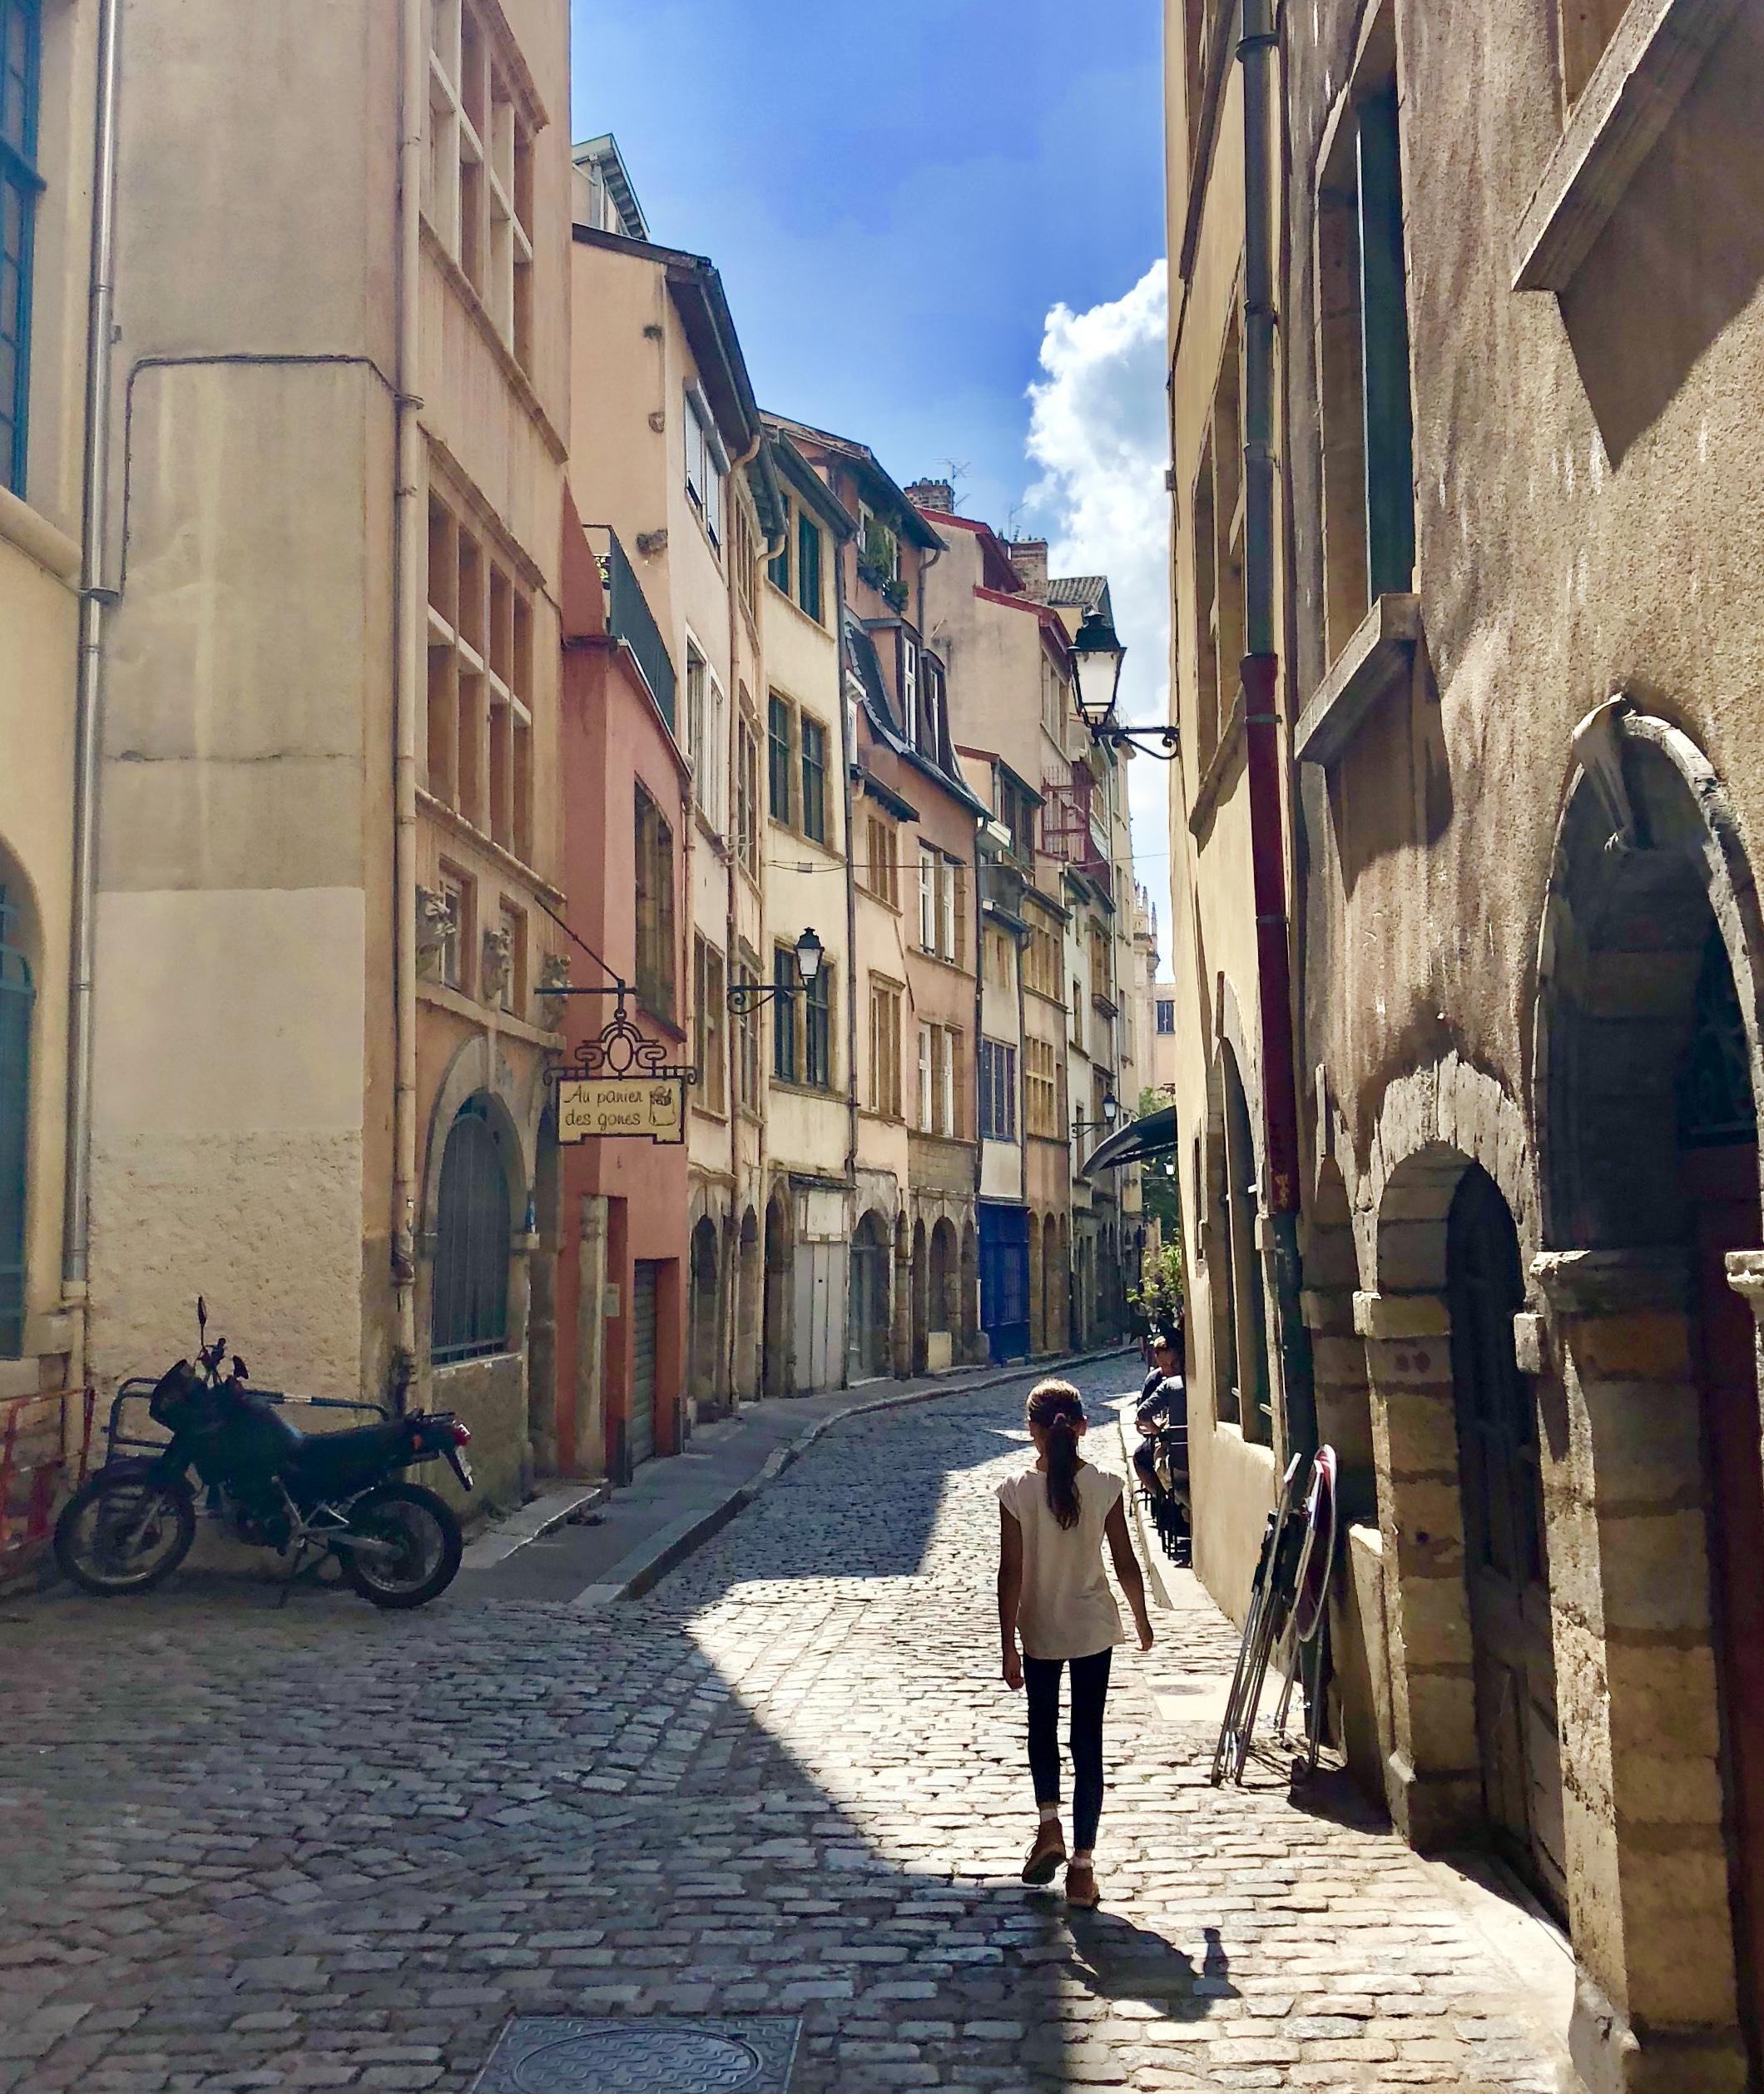 Vieux Lyon, Saint George neighborhood